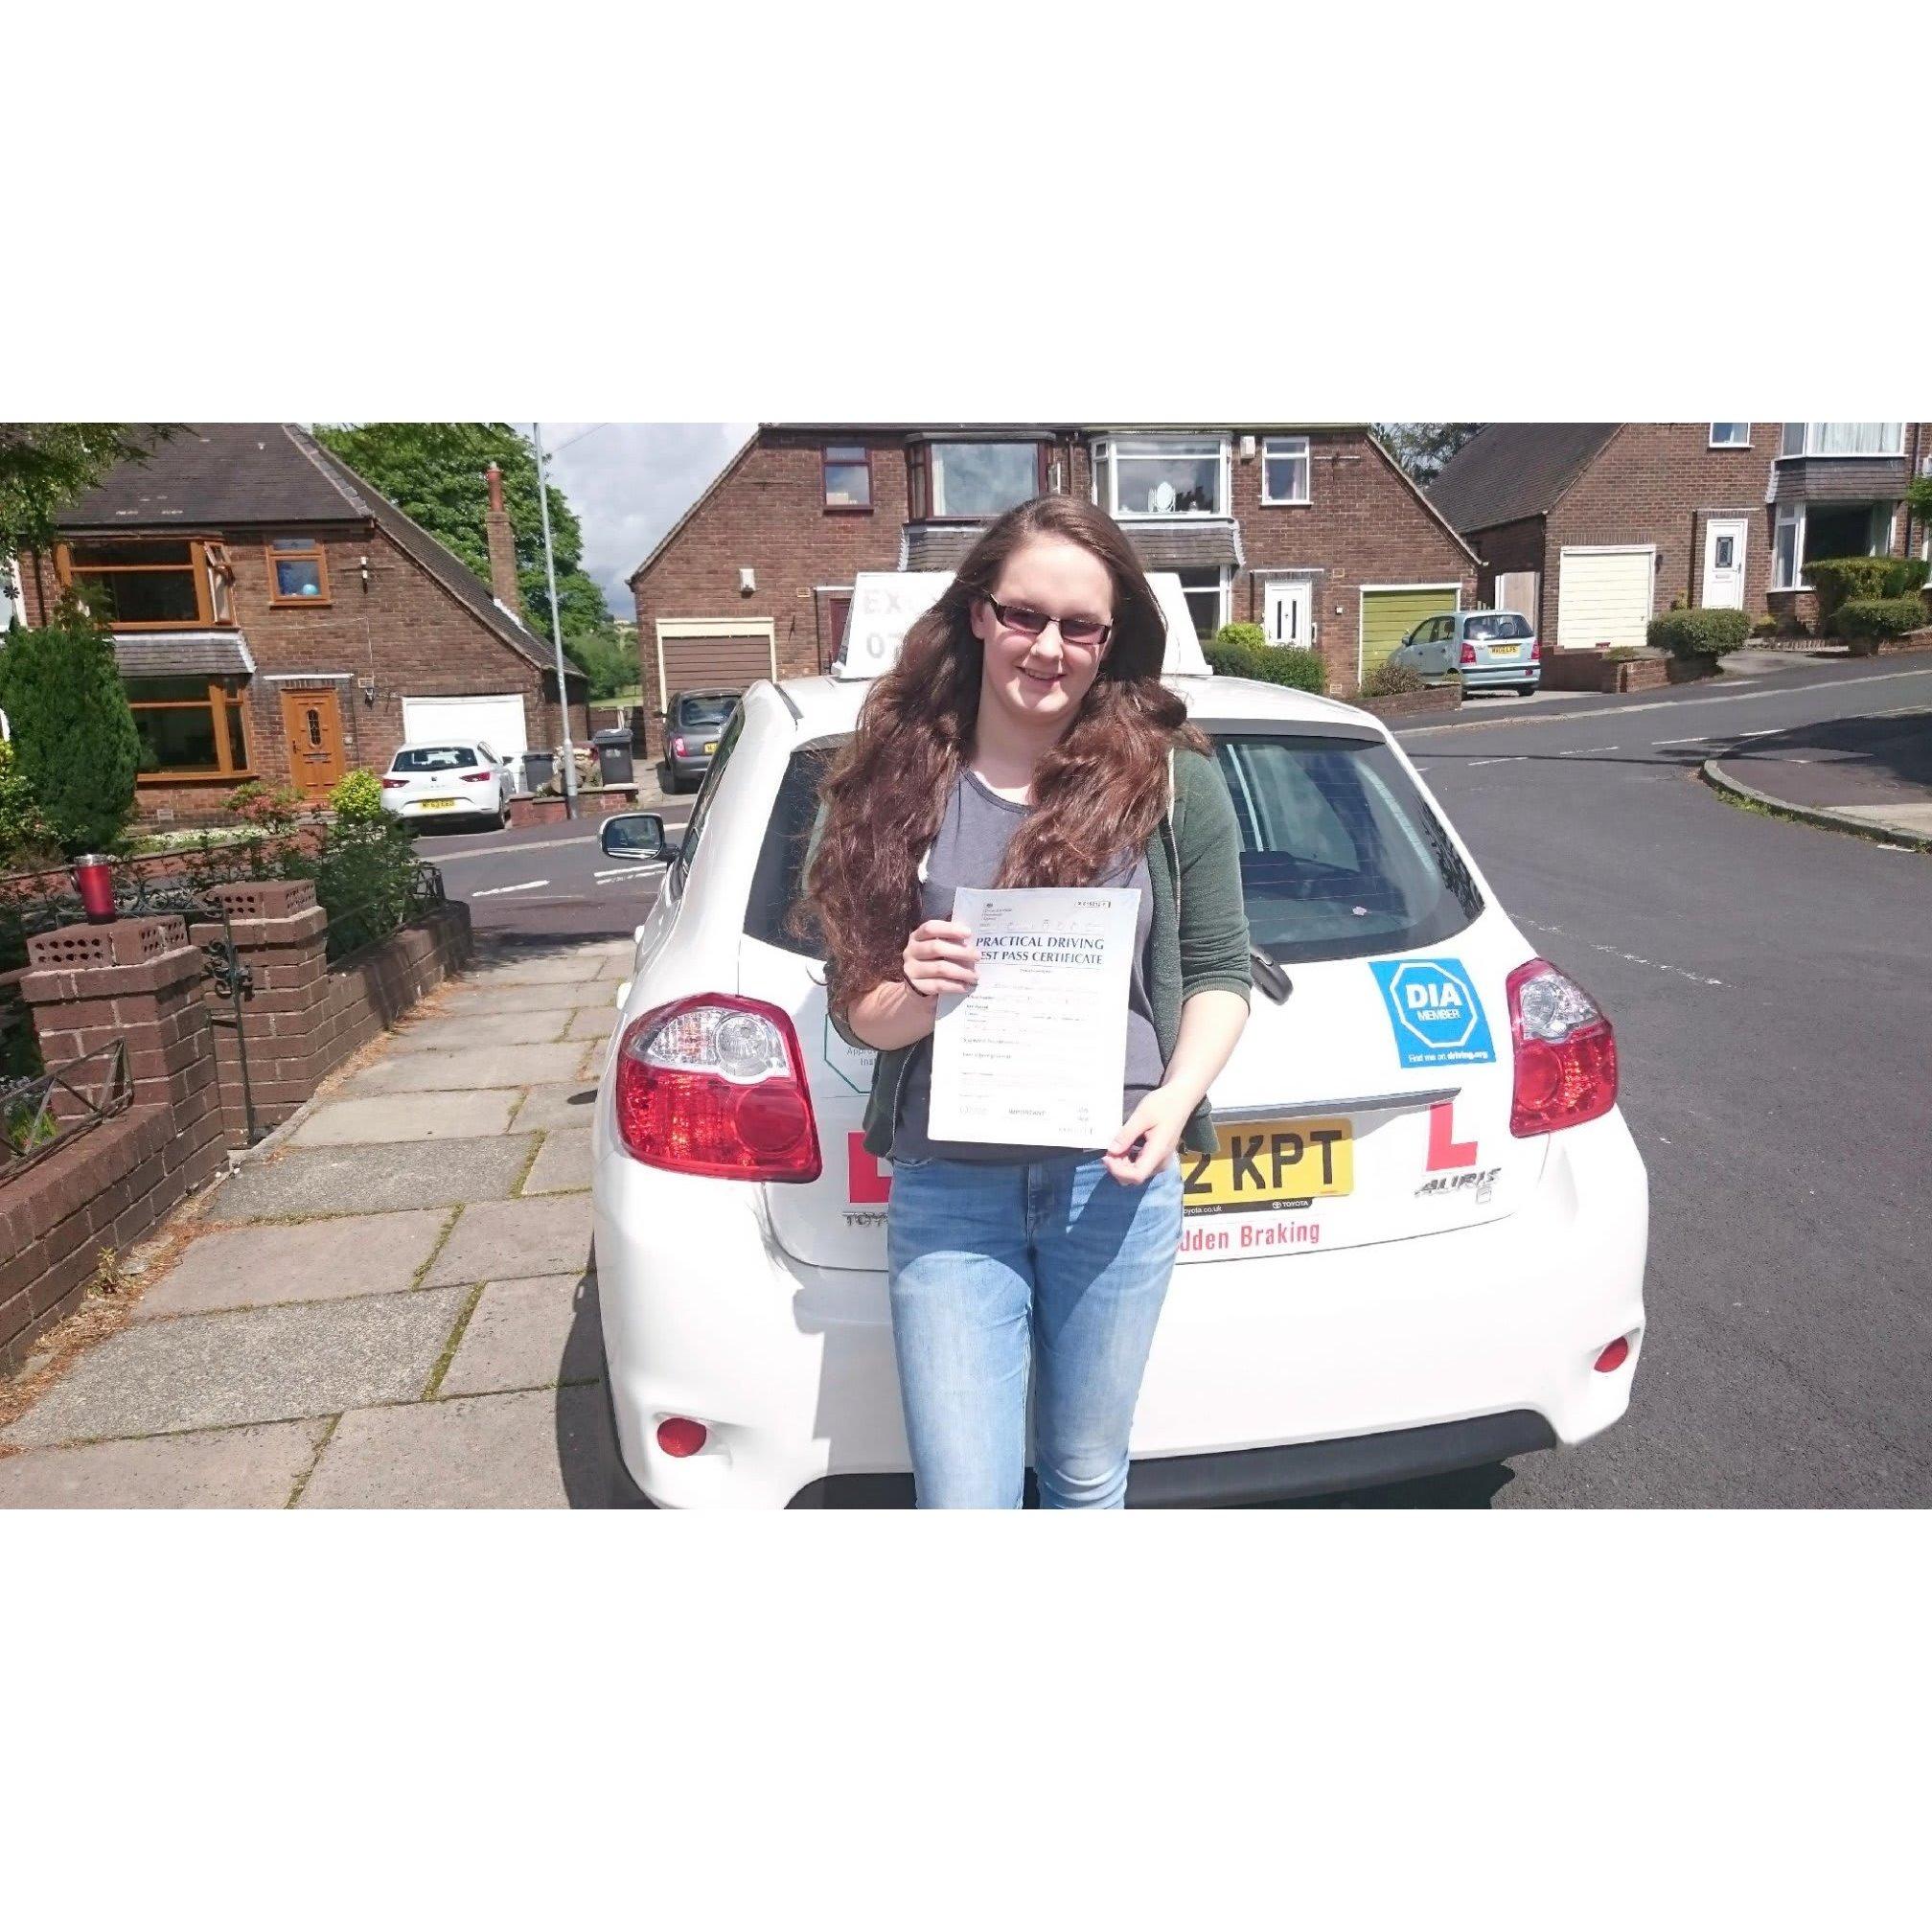 Harwood Driving School - Bolton, Lancashire BL2 4EY - 07594 310716 | ShowMeLocal.com